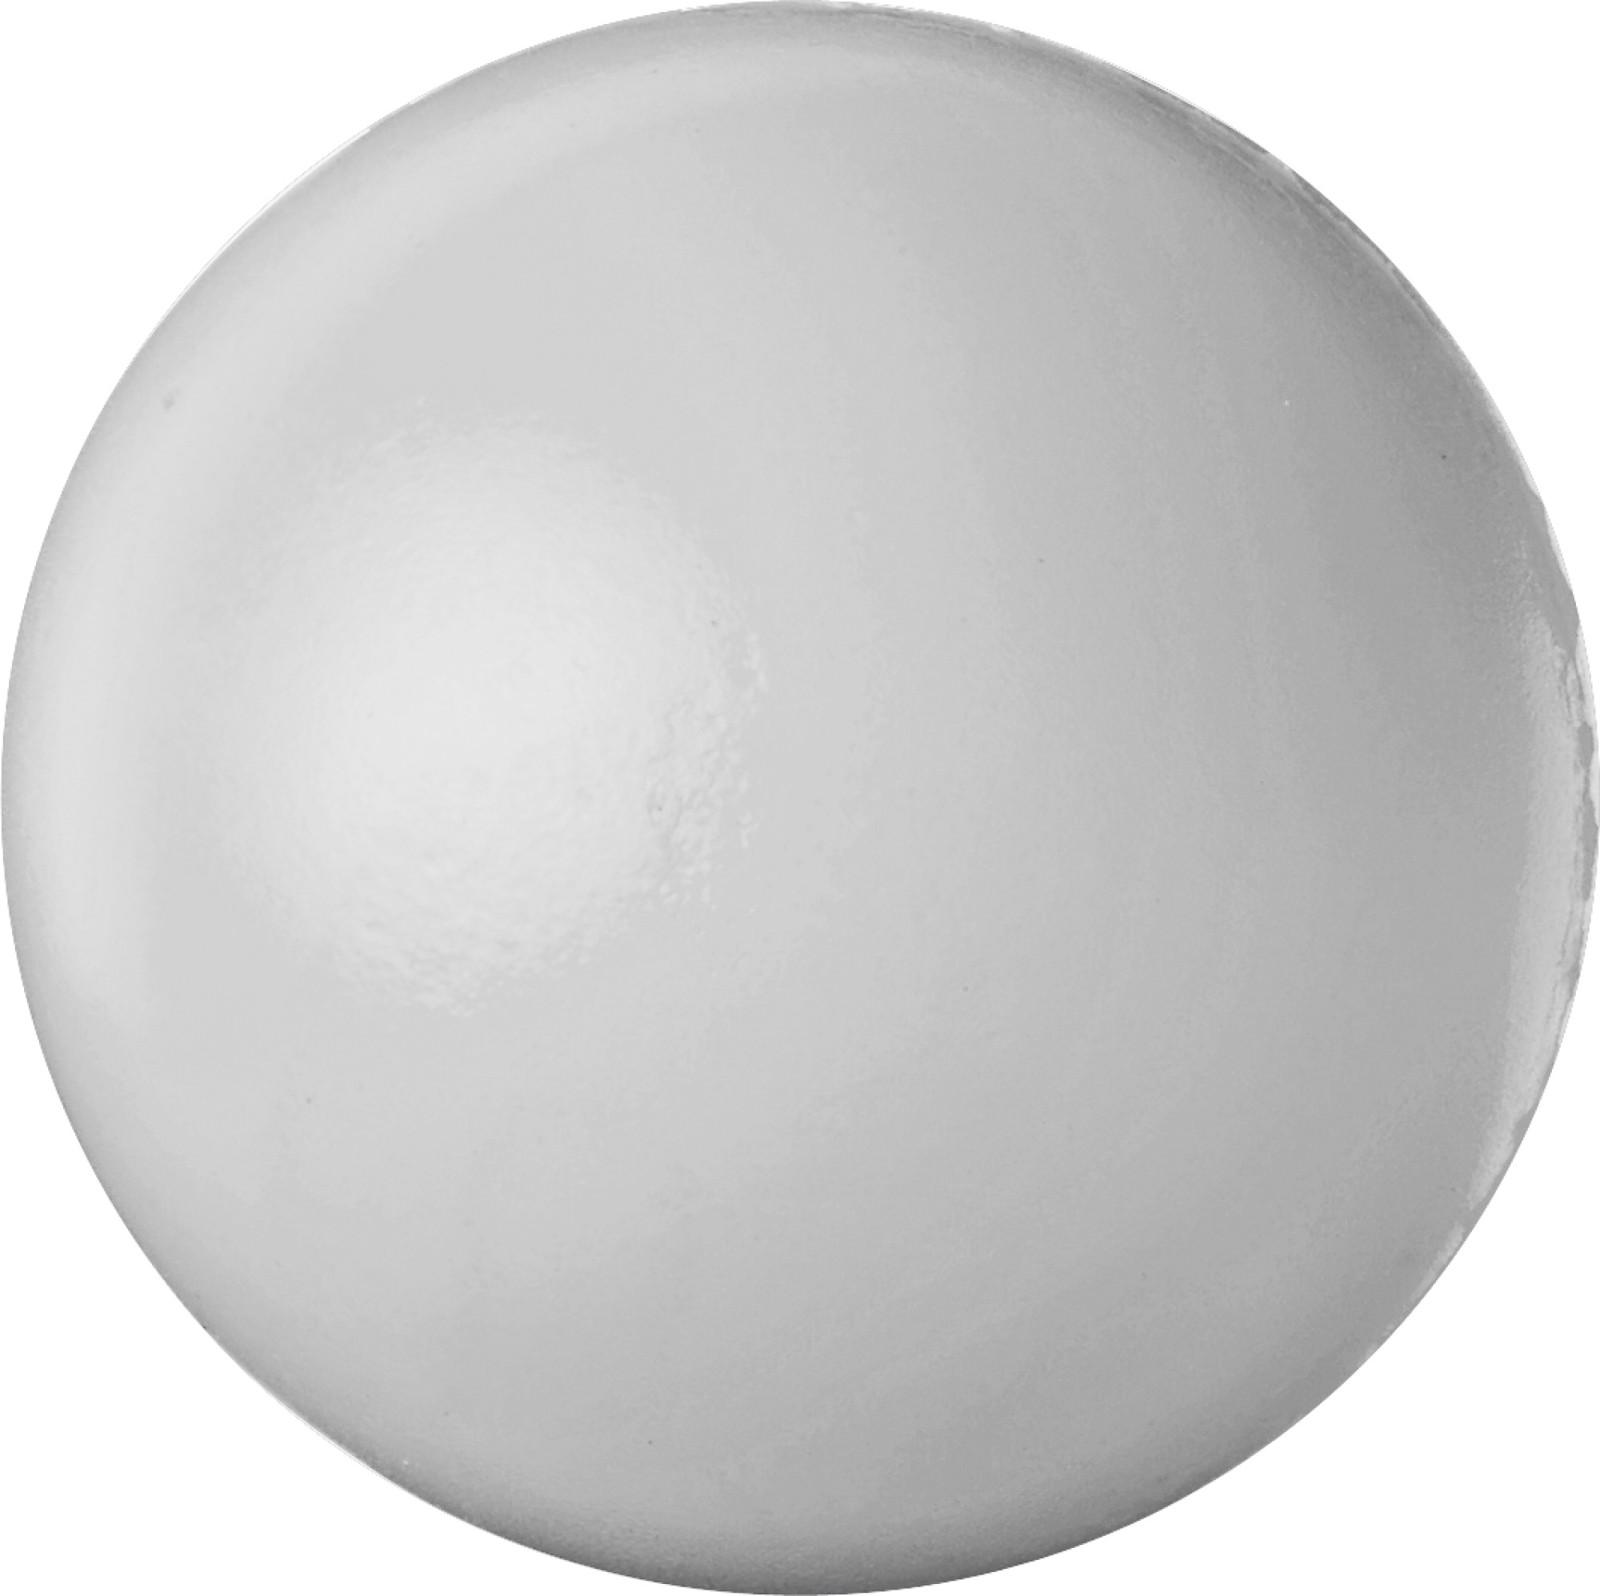 PU foam stress ball - Silver